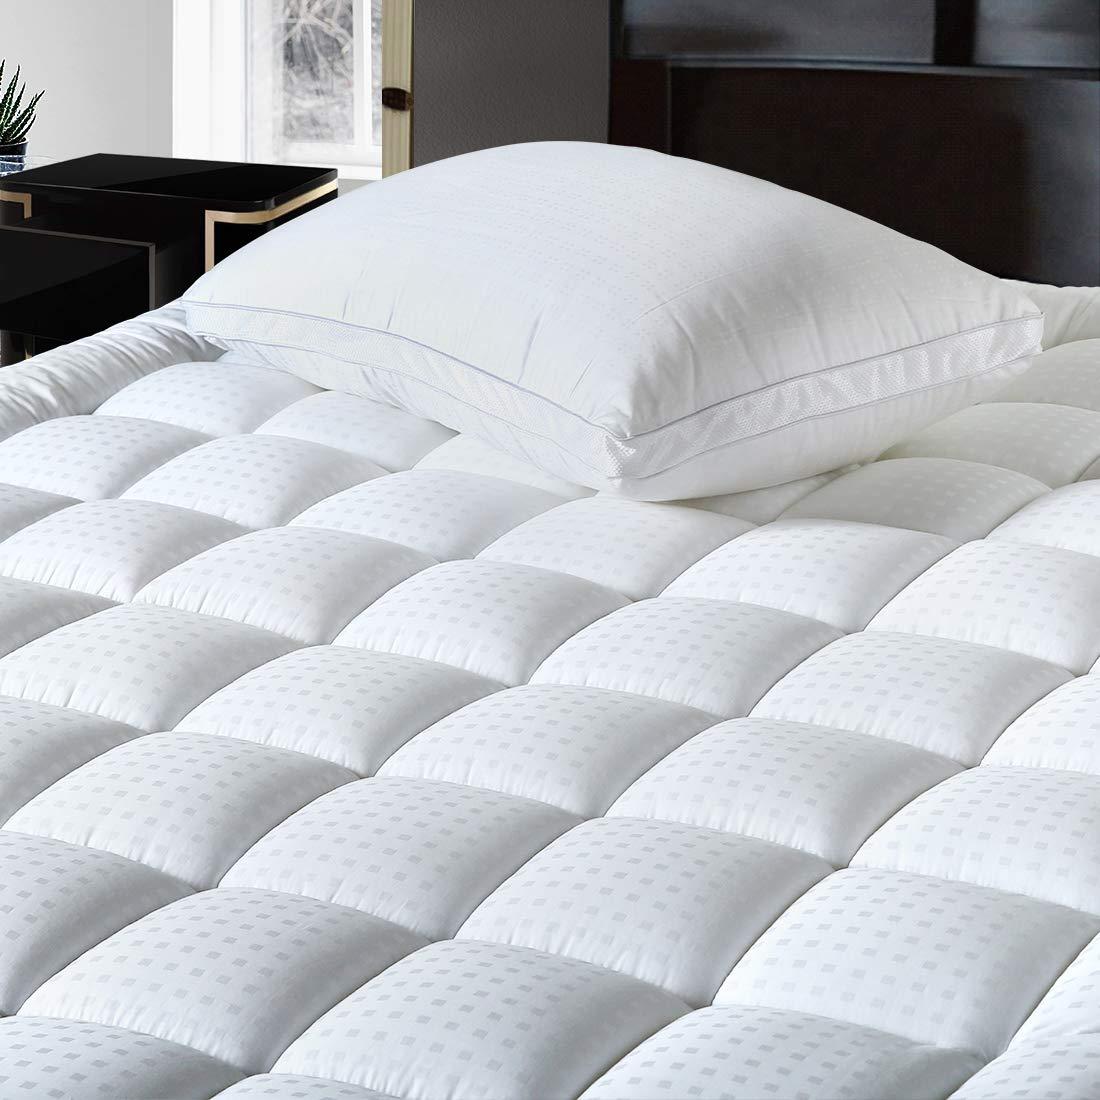 Balichun Pillowtop Mattress Cotton Alternative